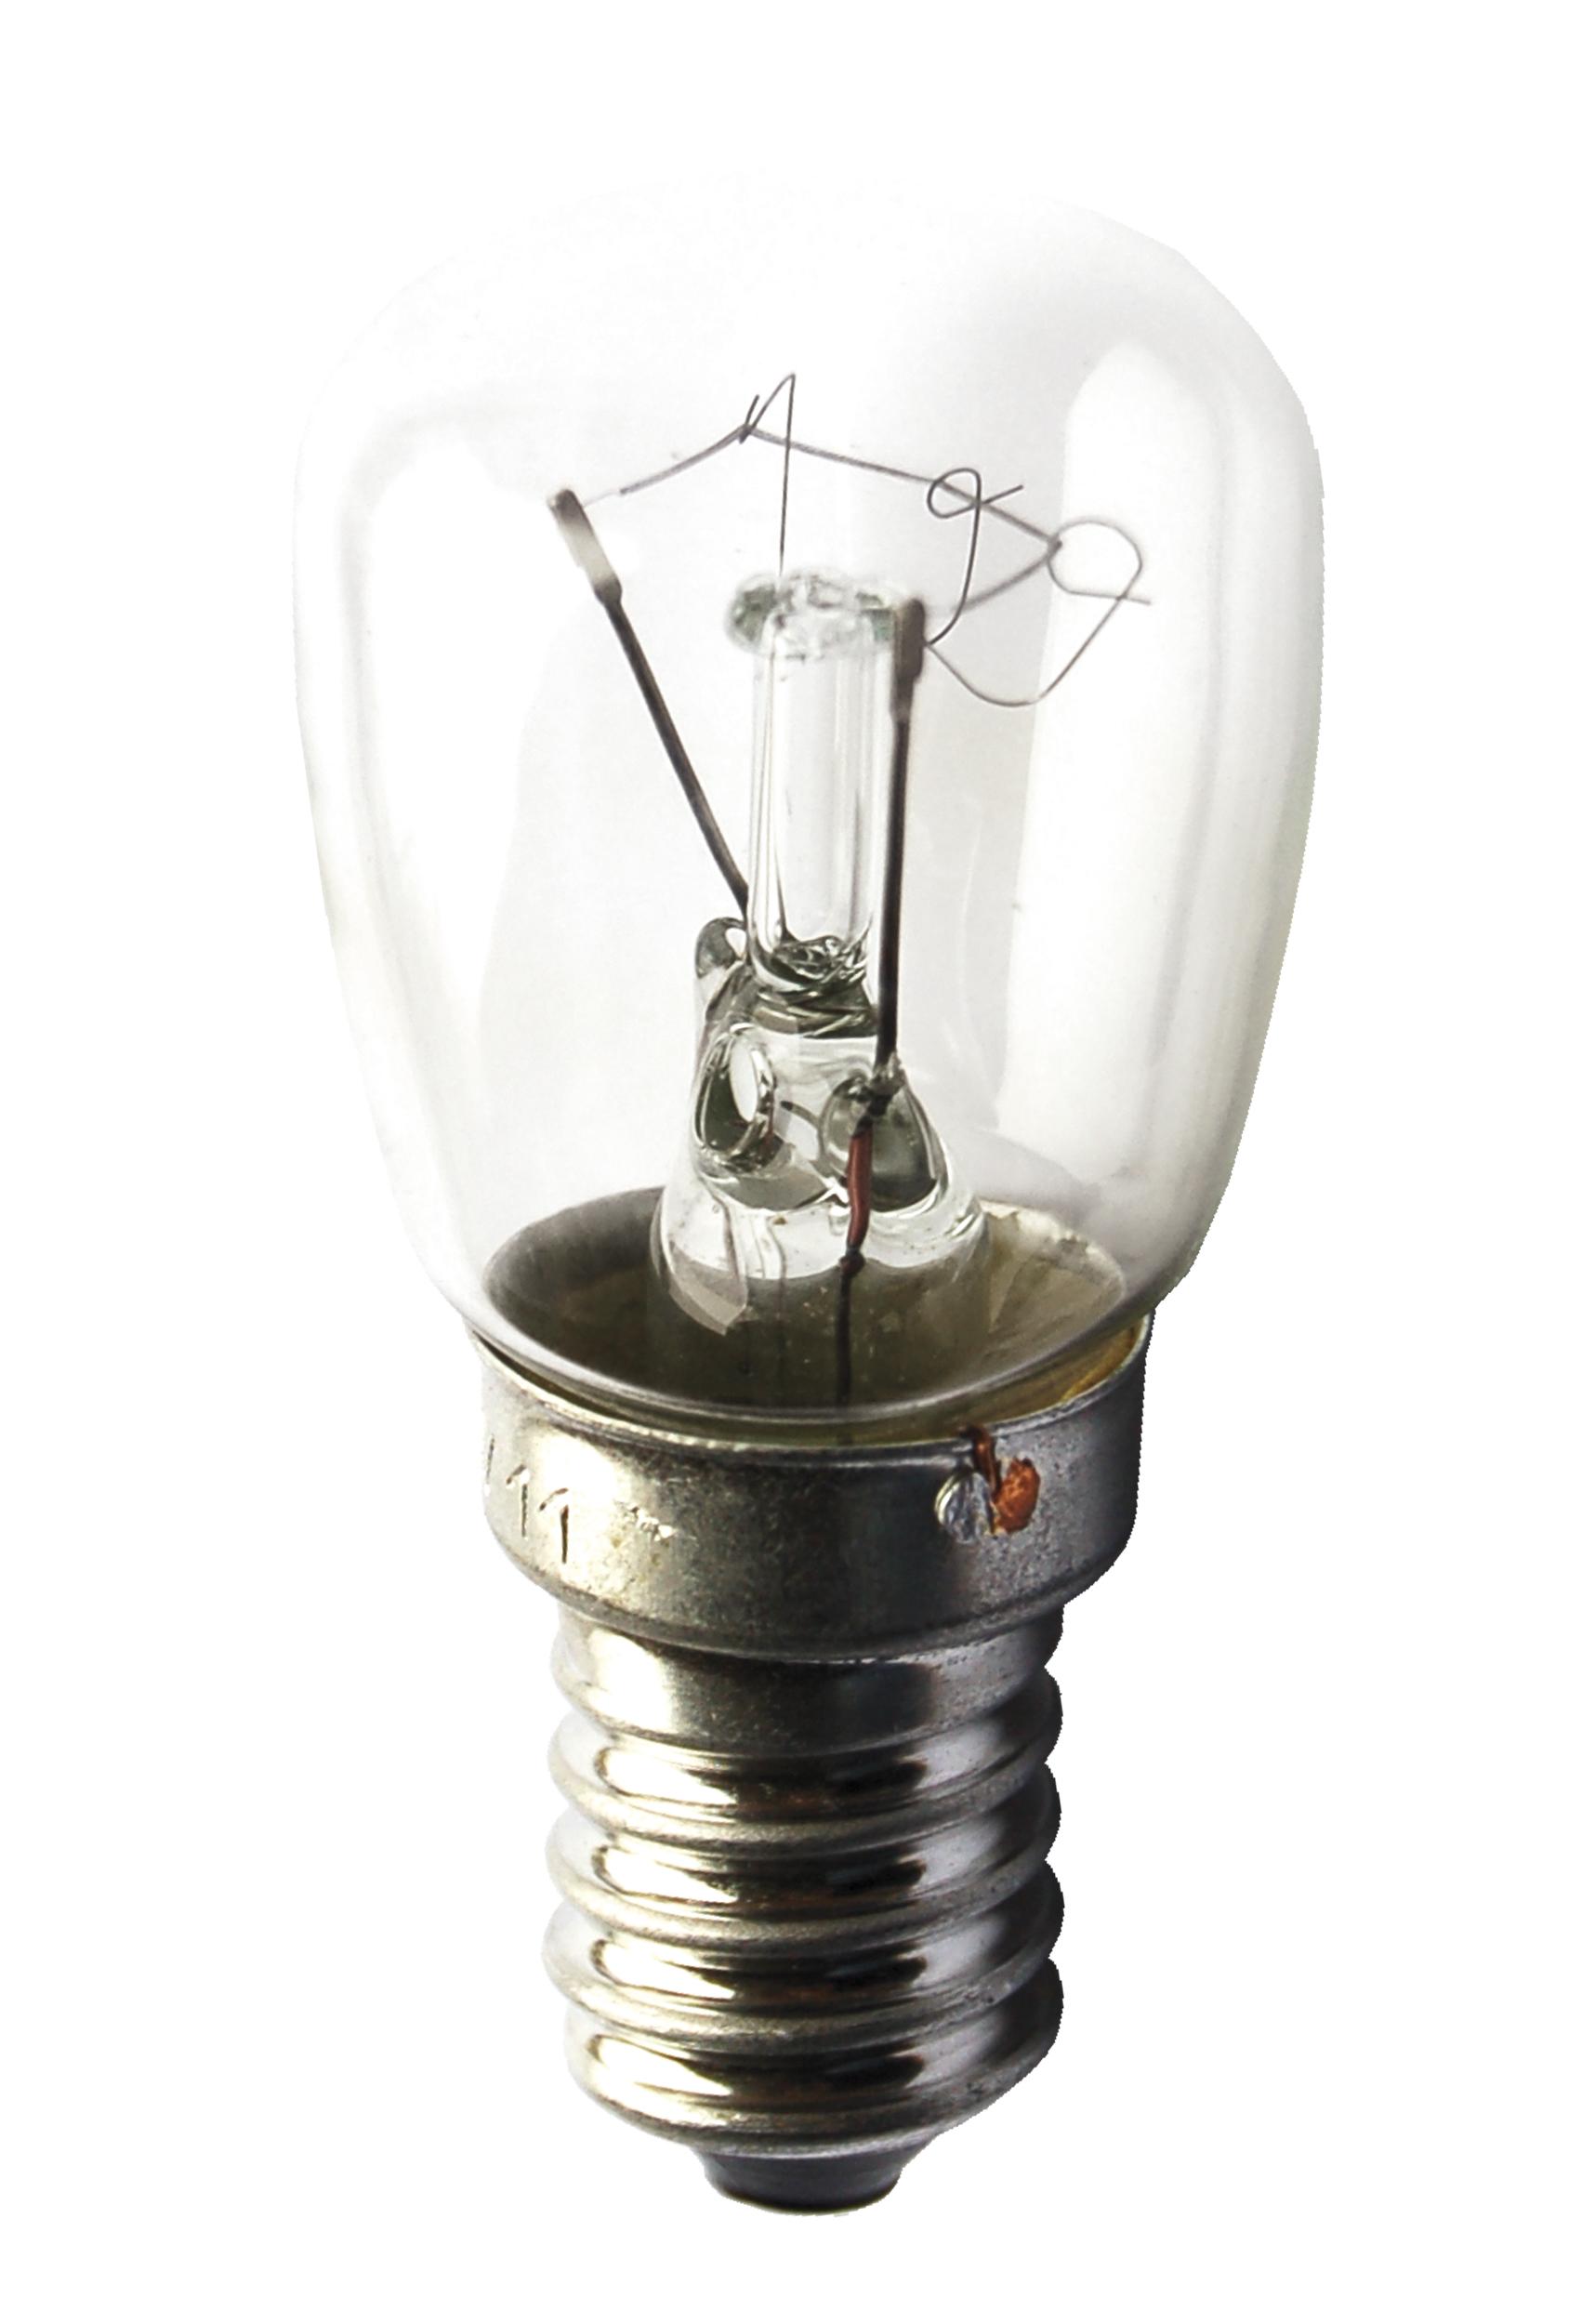 Panel And Household Light Bulb Helios